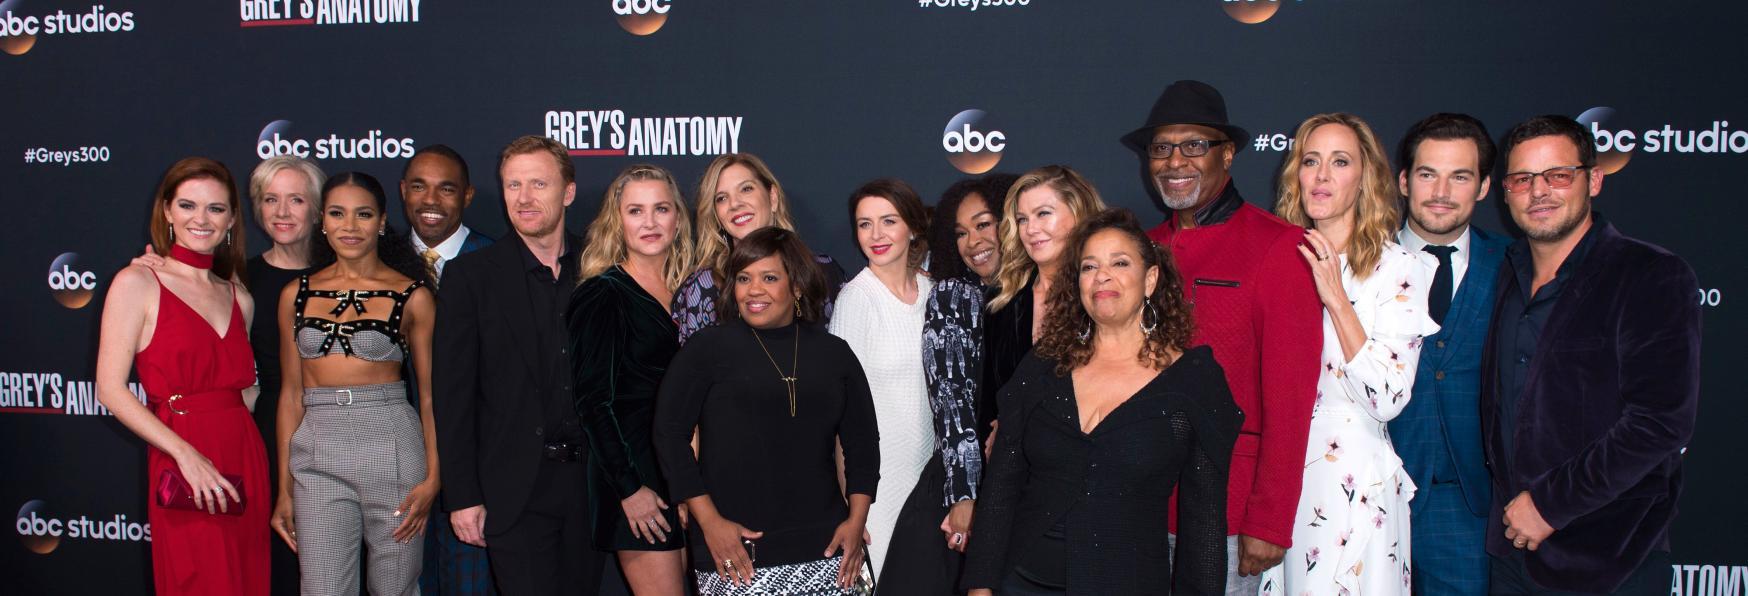 Grey's Anatomy 17: prosegue la Serie TV Medical. Trama, Cast e altre Info Note